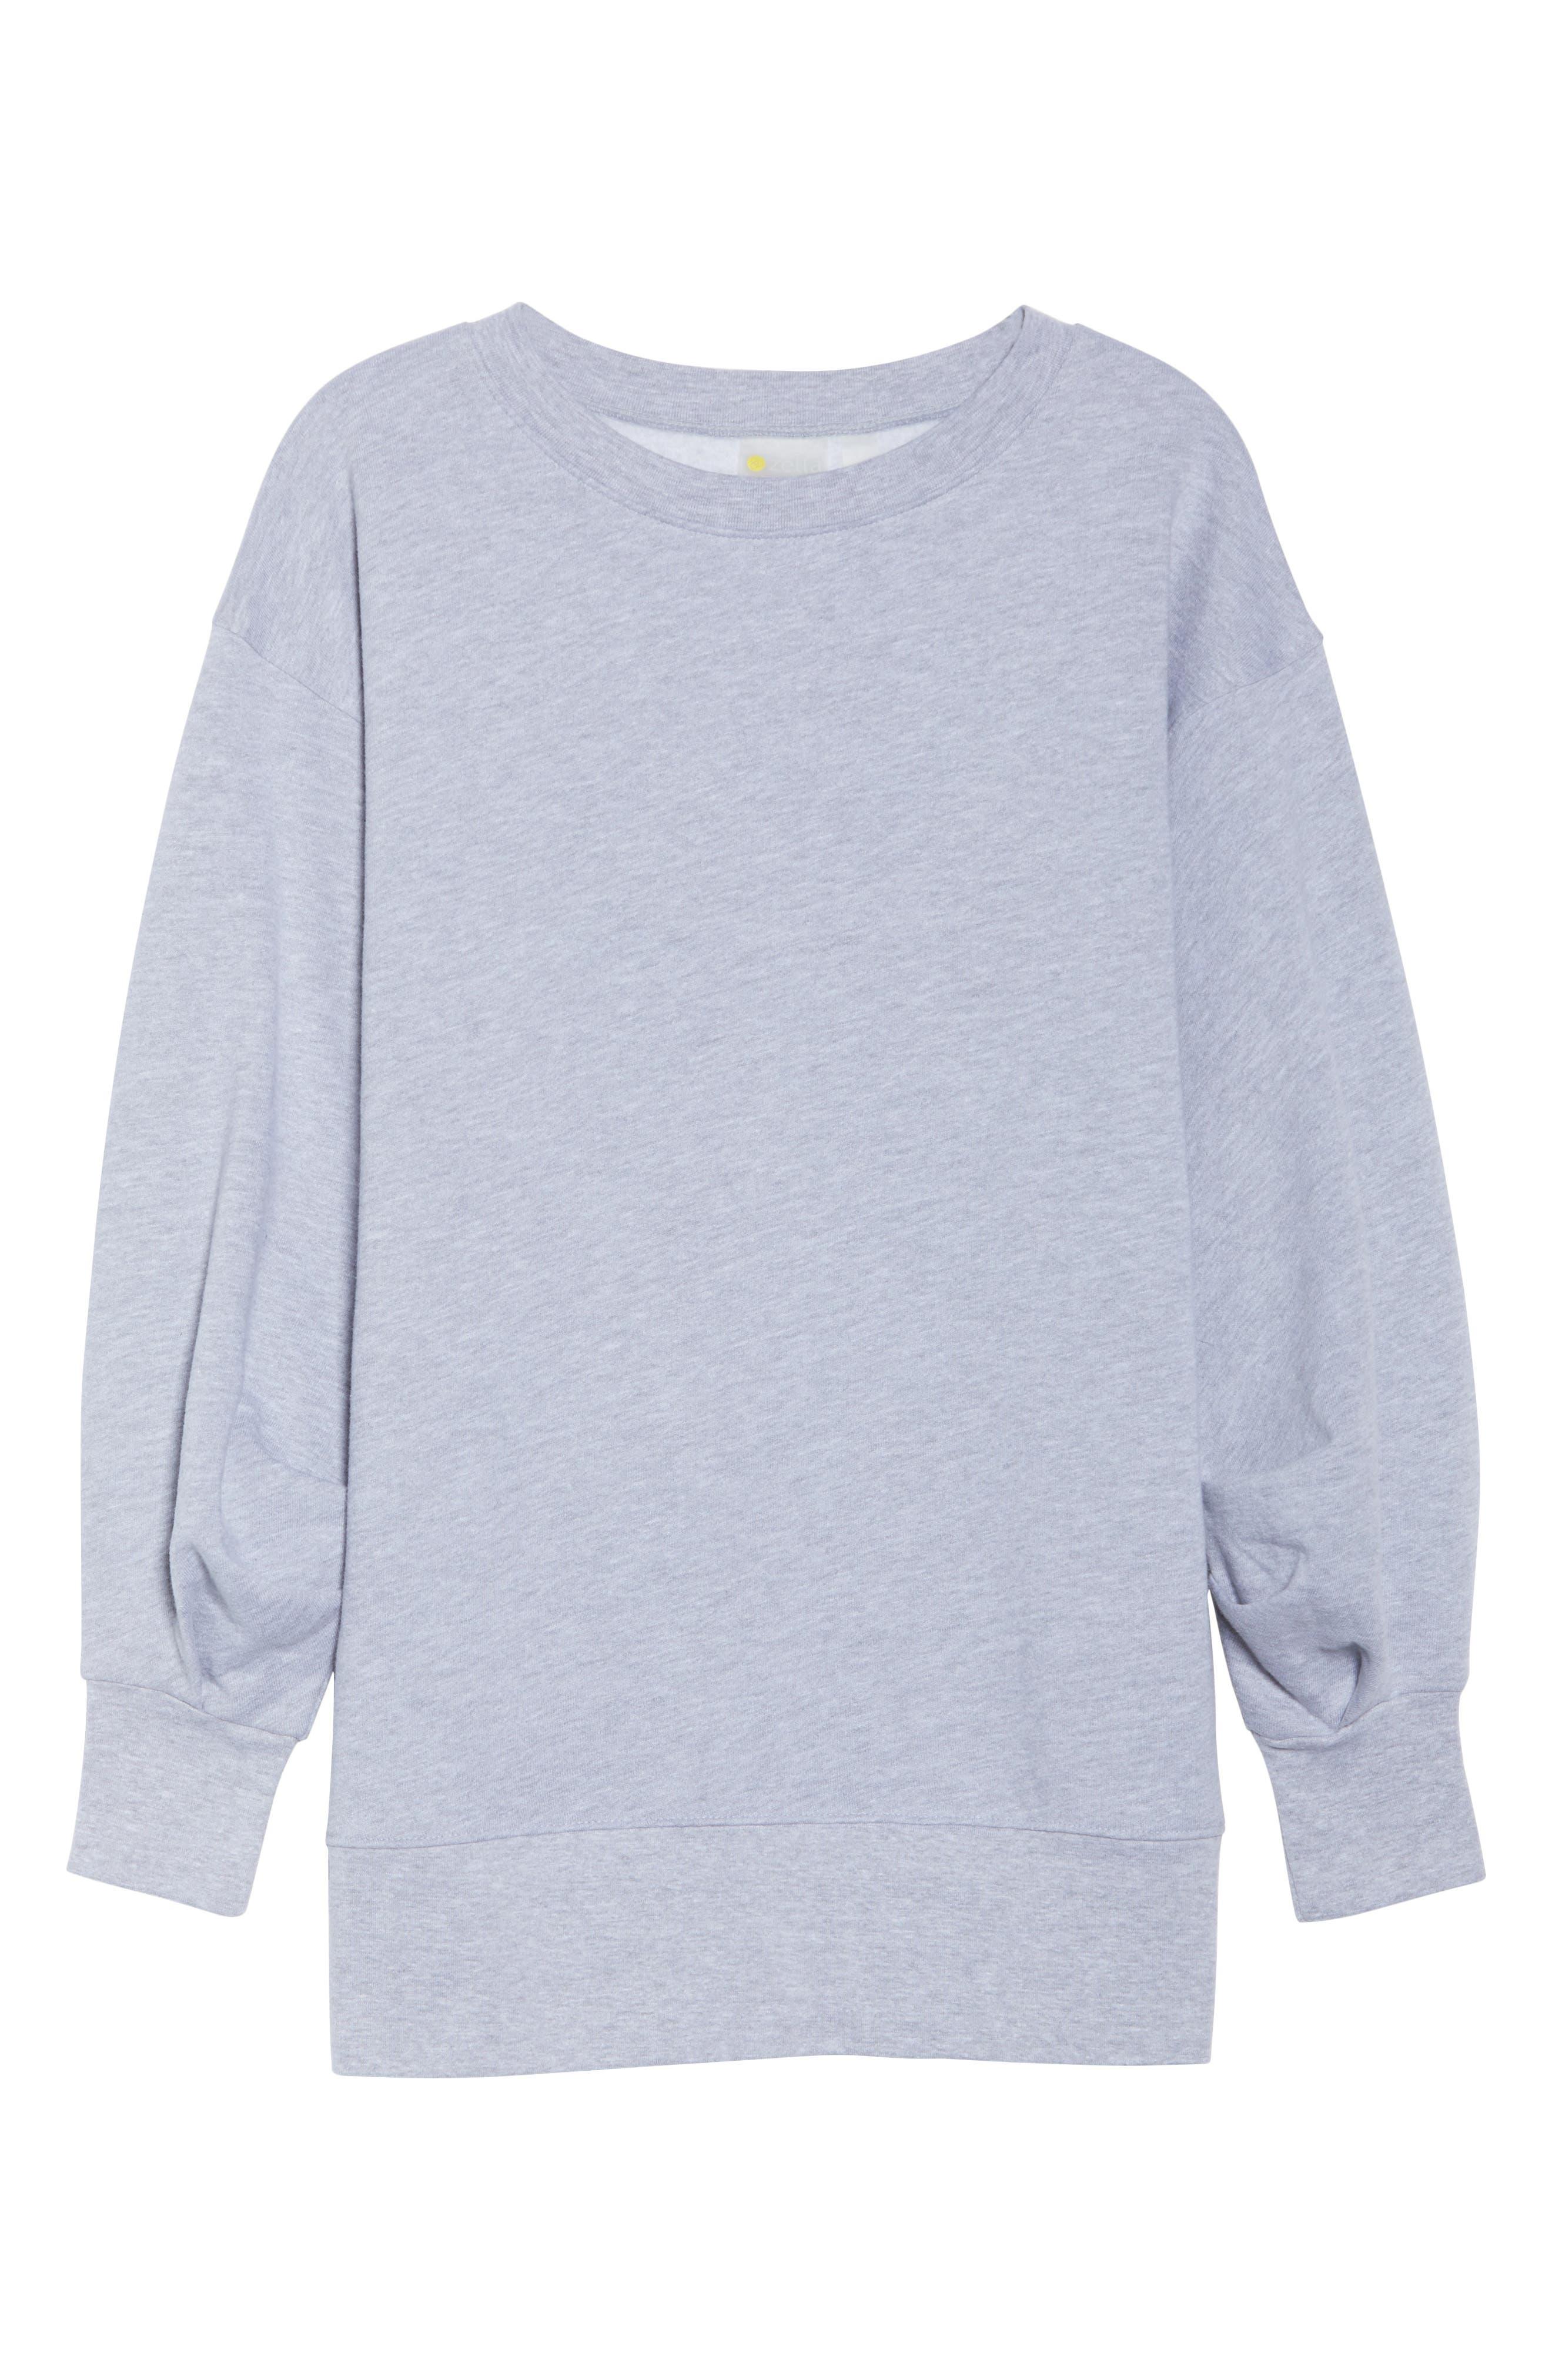 Boxy Oversize Sweatshirt,                             Alternate thumbnail 19, color,